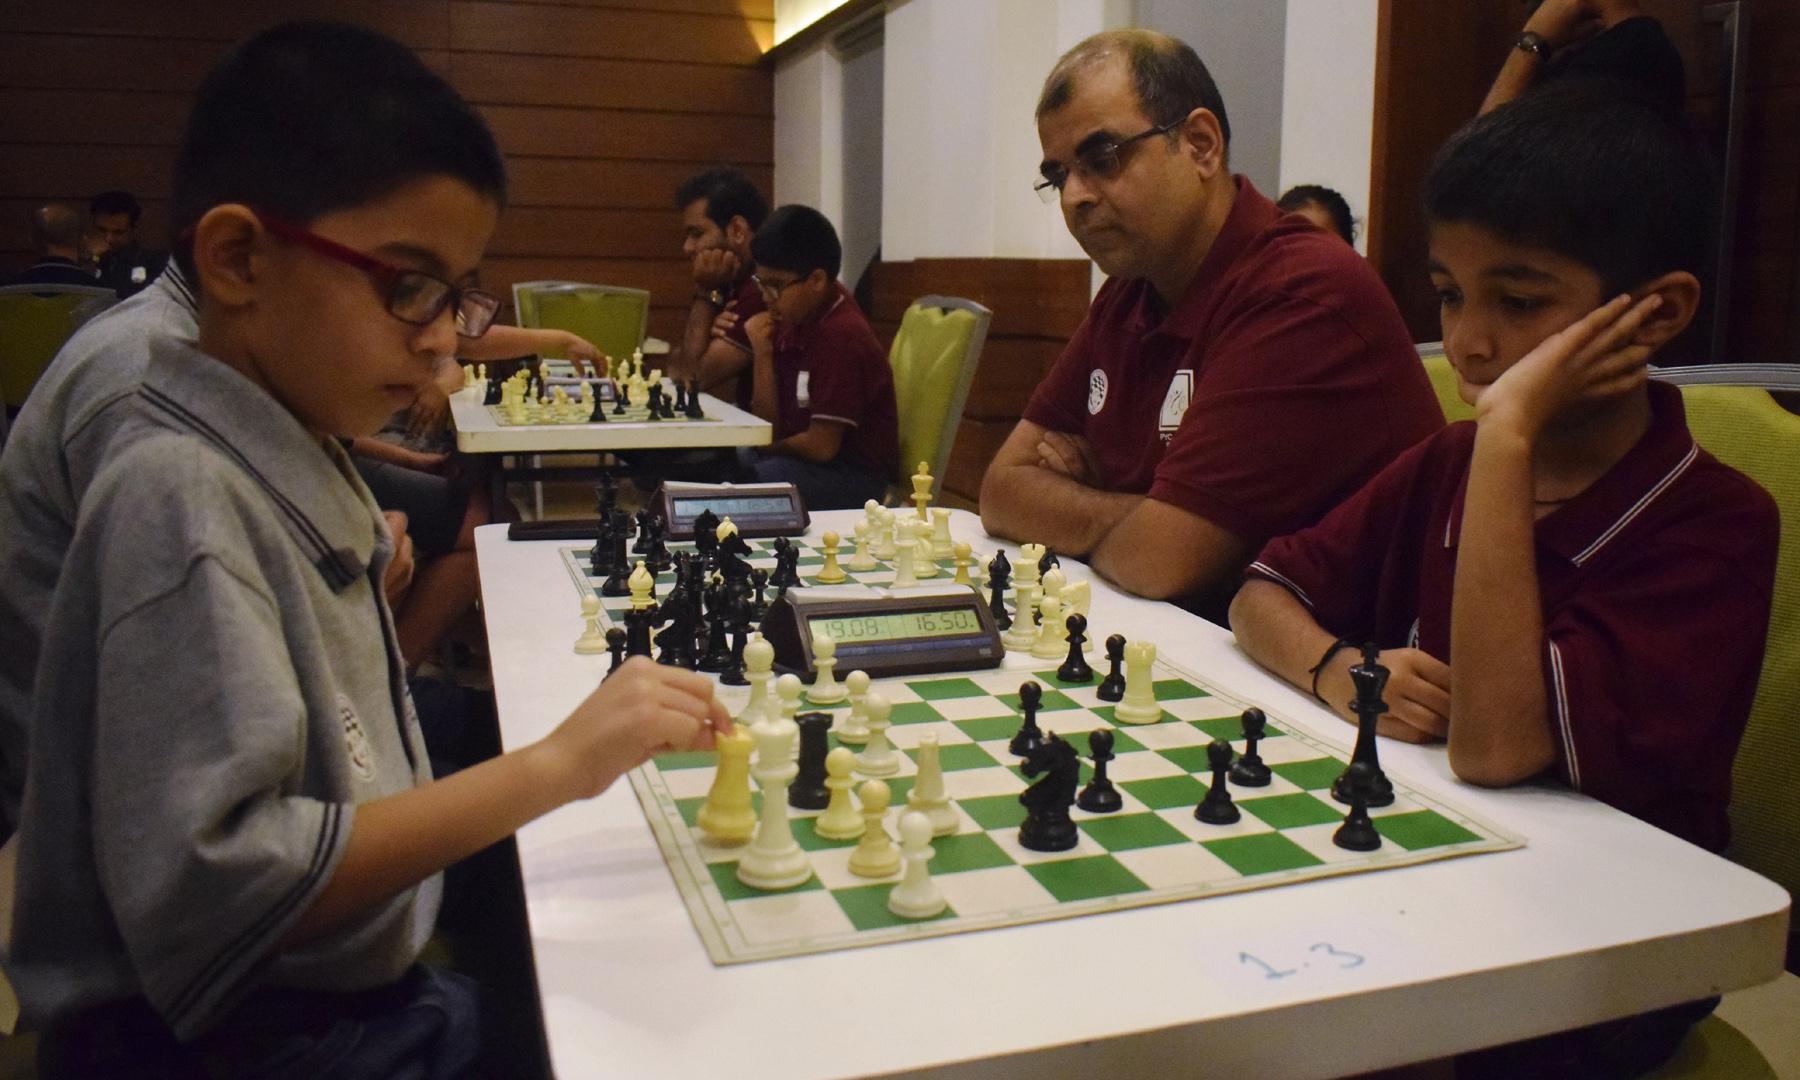 पीवायसी बुद्धिबळ लीग 2019 स्पर्धेत  मराठा वॉरियर्स संघाचा सलग दुसरा विजय